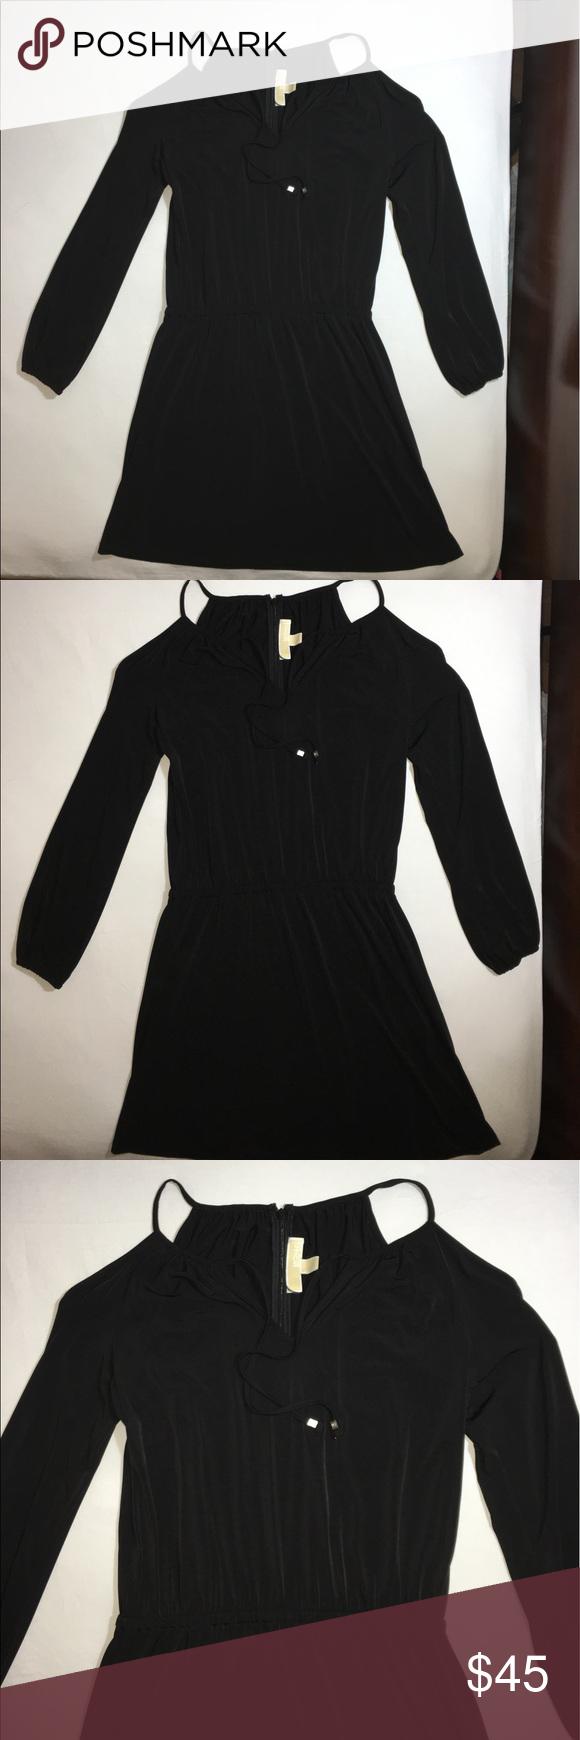 Black Michael kors dress In good condition. Michael Kors Dresses